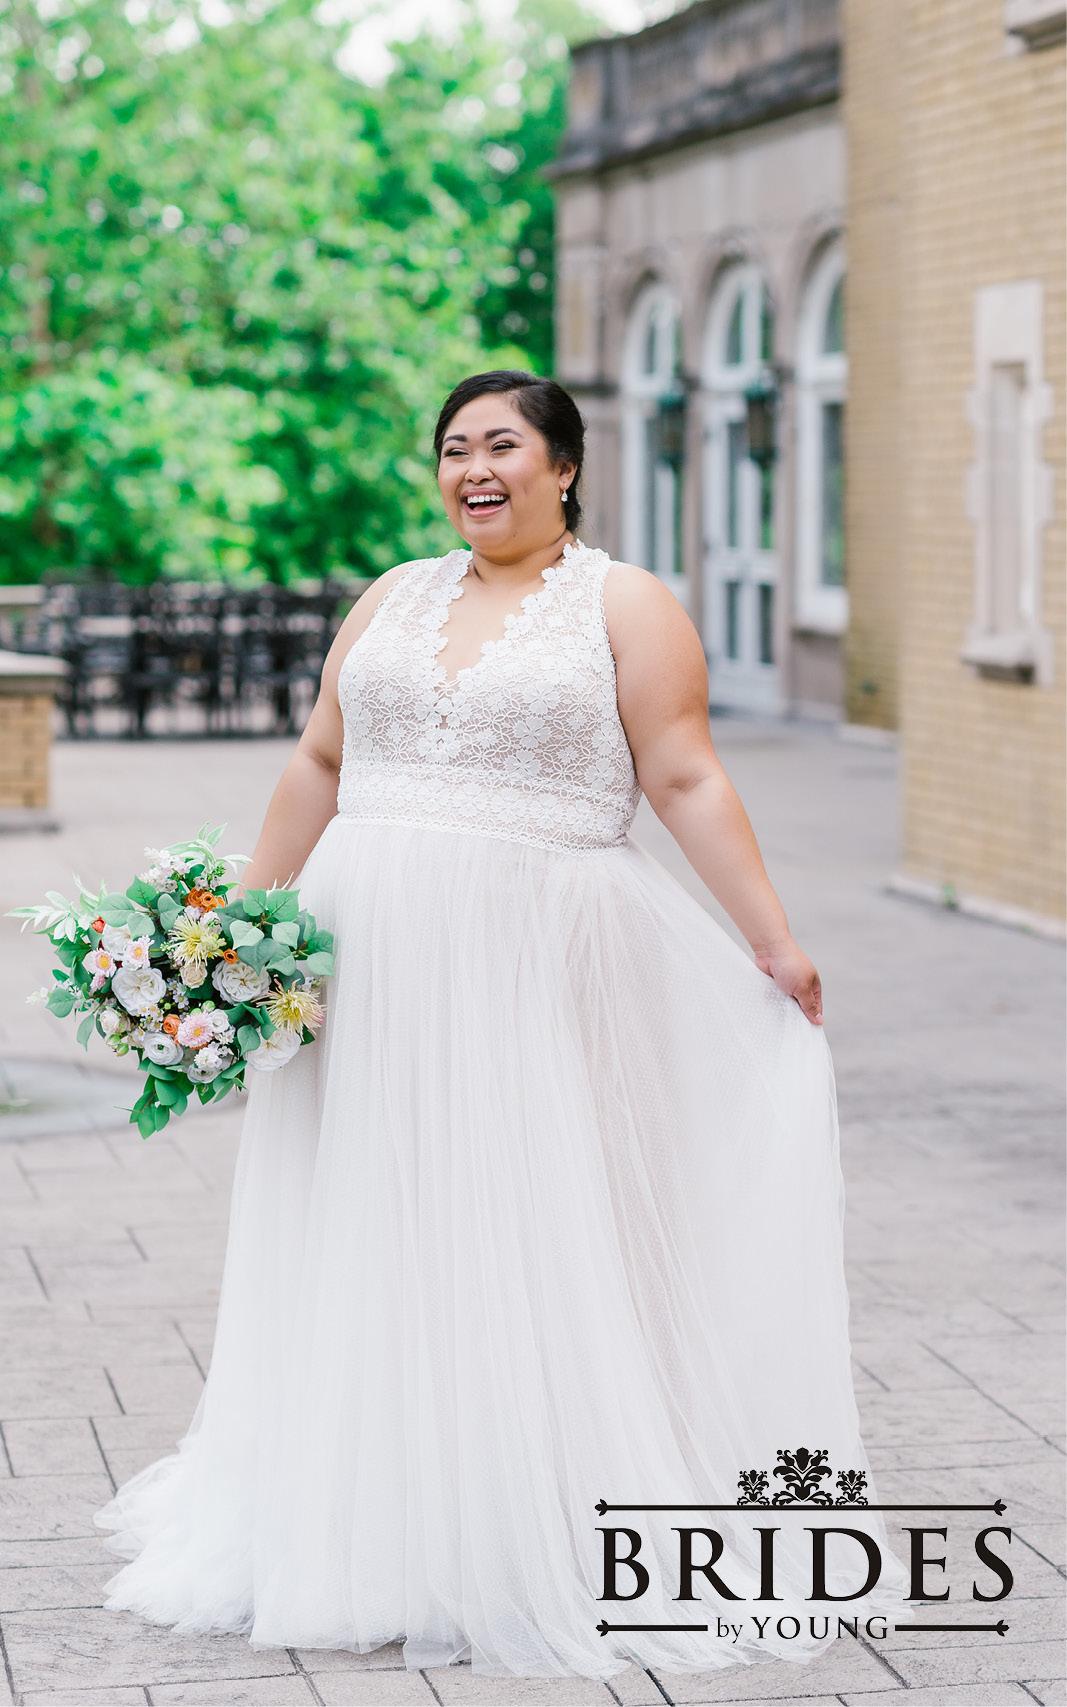 BridesbyYoung-2020Collection-PlusSizeBridalBoutique-CurvyWeddingDressInspiration-7.jpg